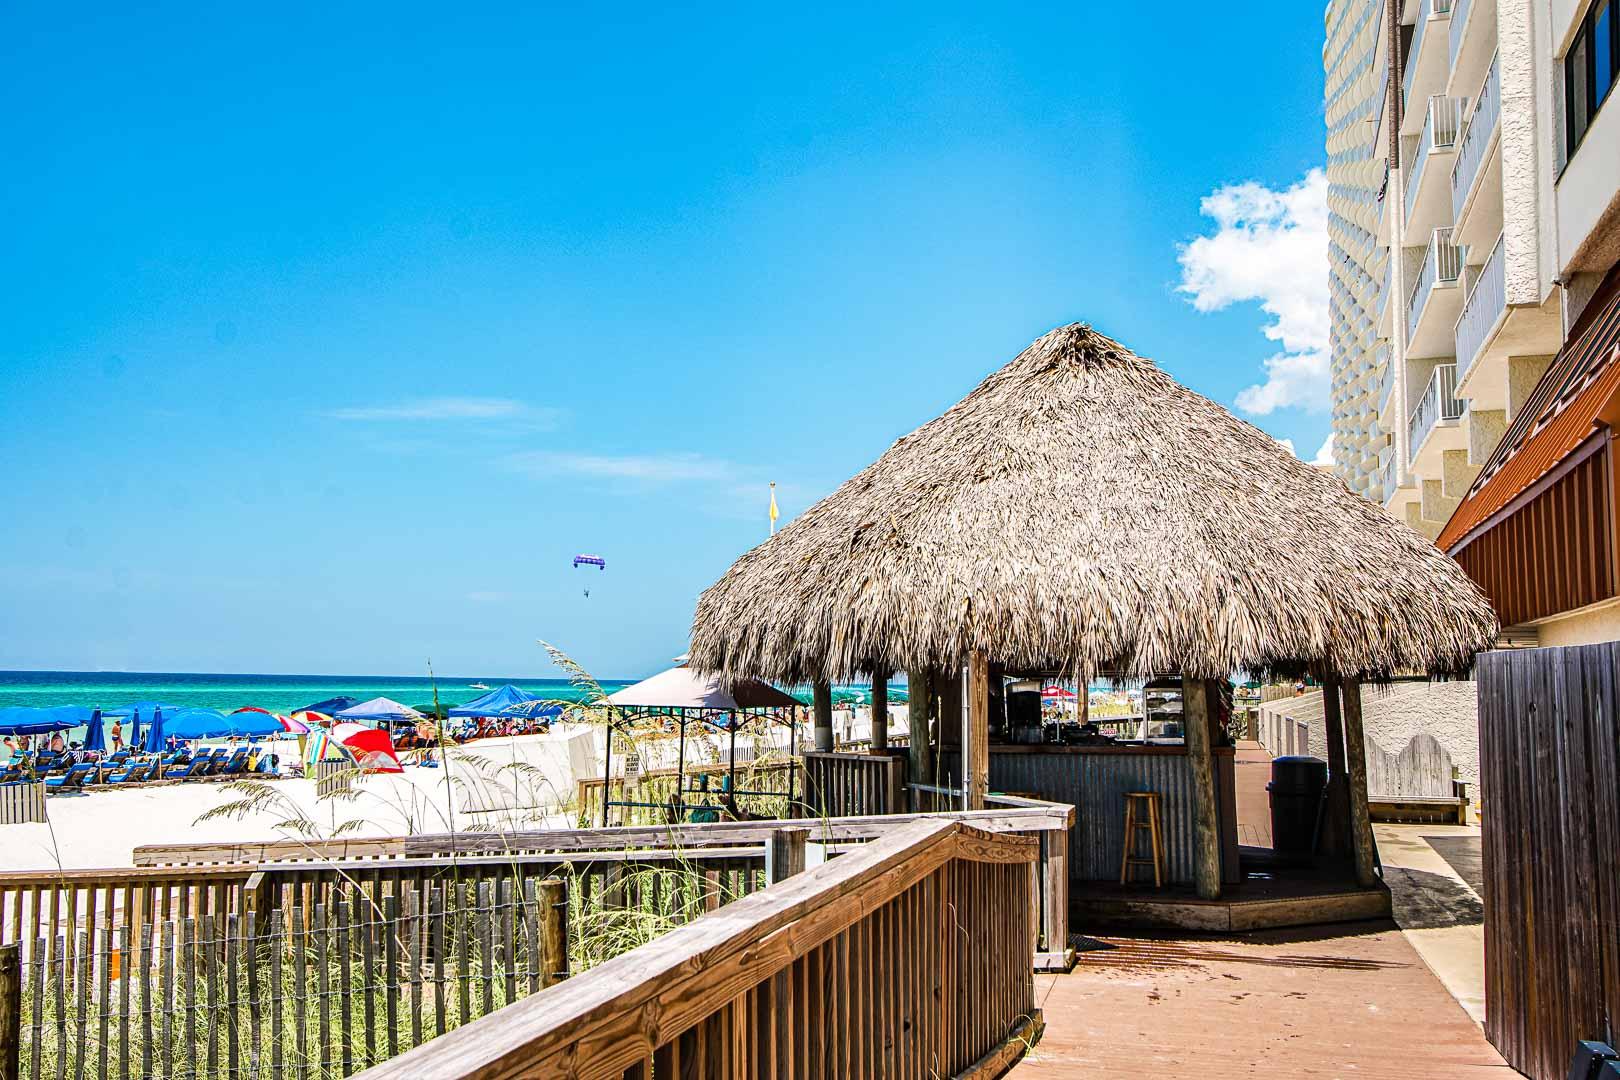 A view of the beach from VRI's Landmark Holiday Beach Resort in Panama City, Florida.